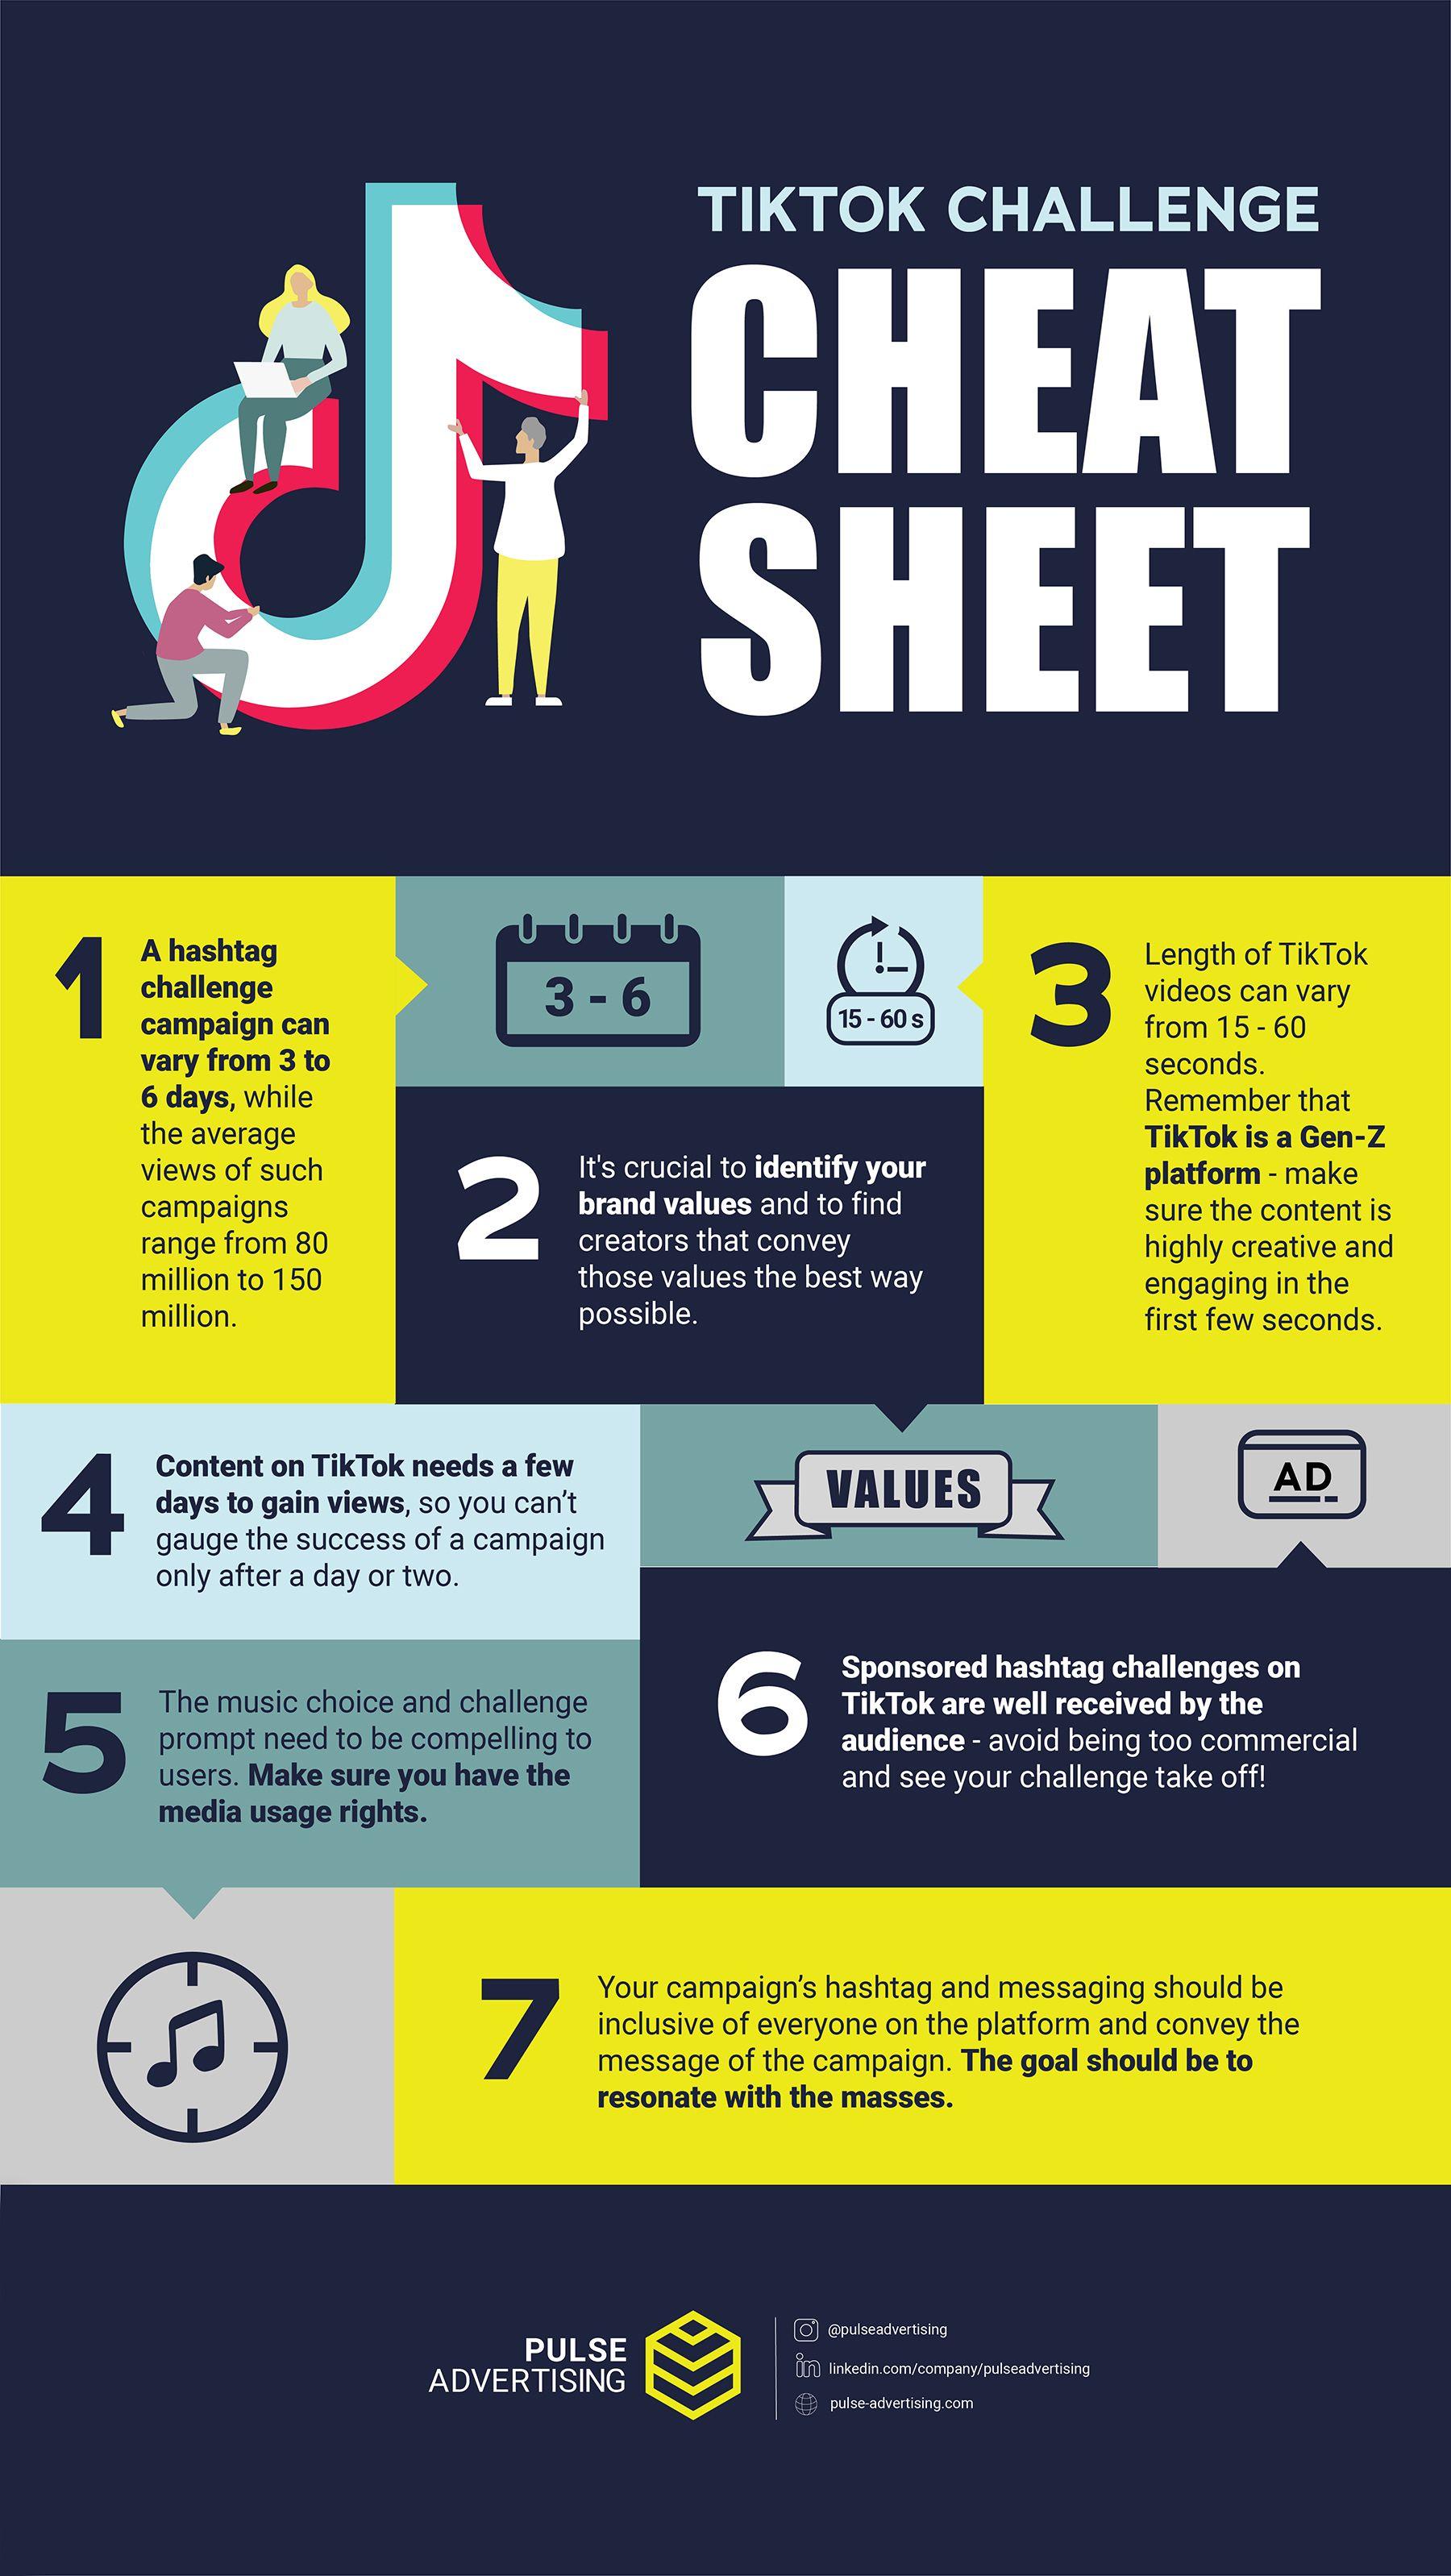 Tiktok Challenge Cheat Sheet Social Media Infographic Marketing Strategy Social Media Snapchat Marketing